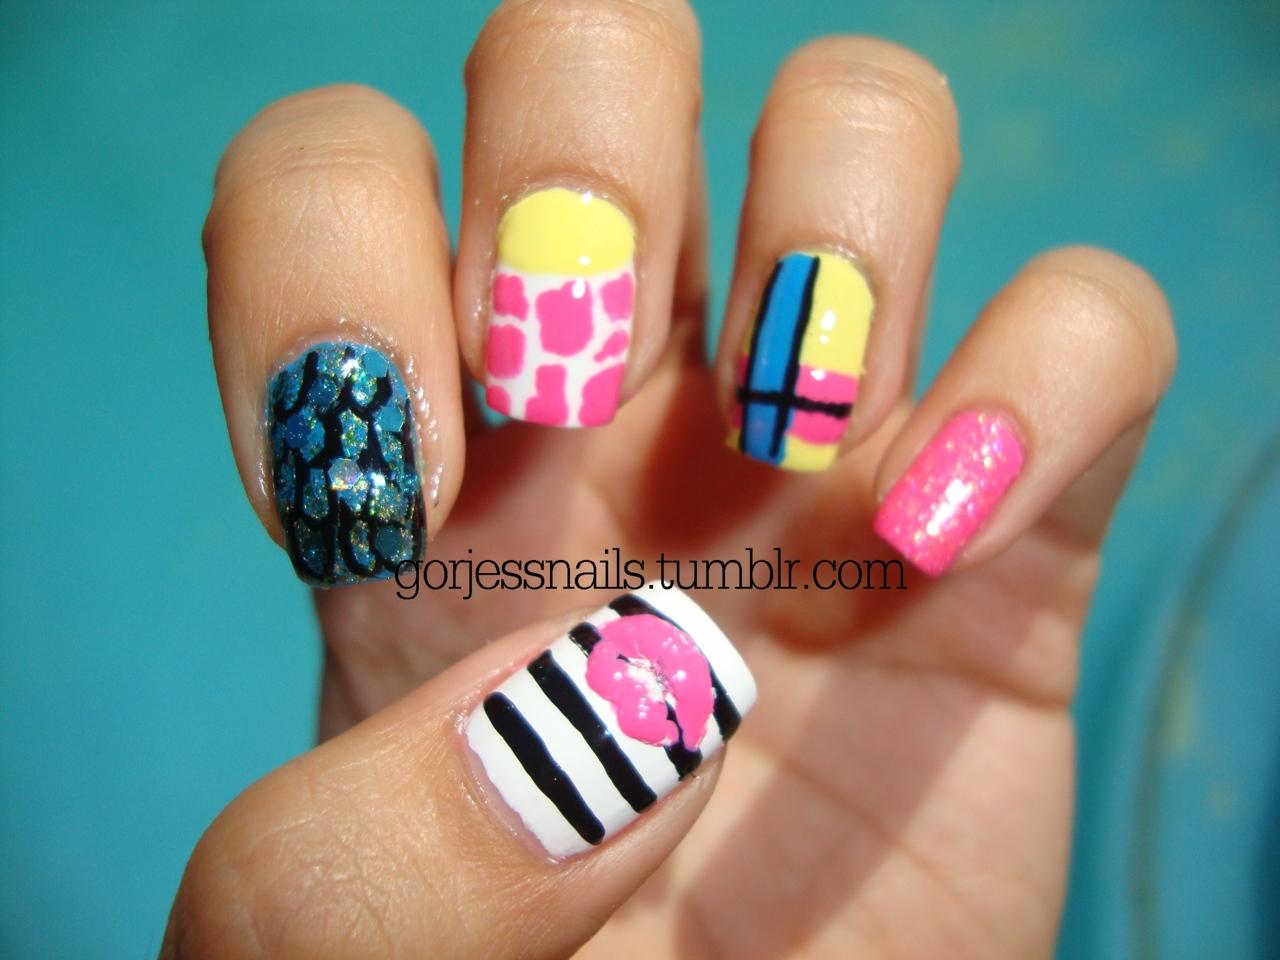 13 Nicki Minaj Pointy Nail Designs Images - Nicki Minaj Nail Designs ...